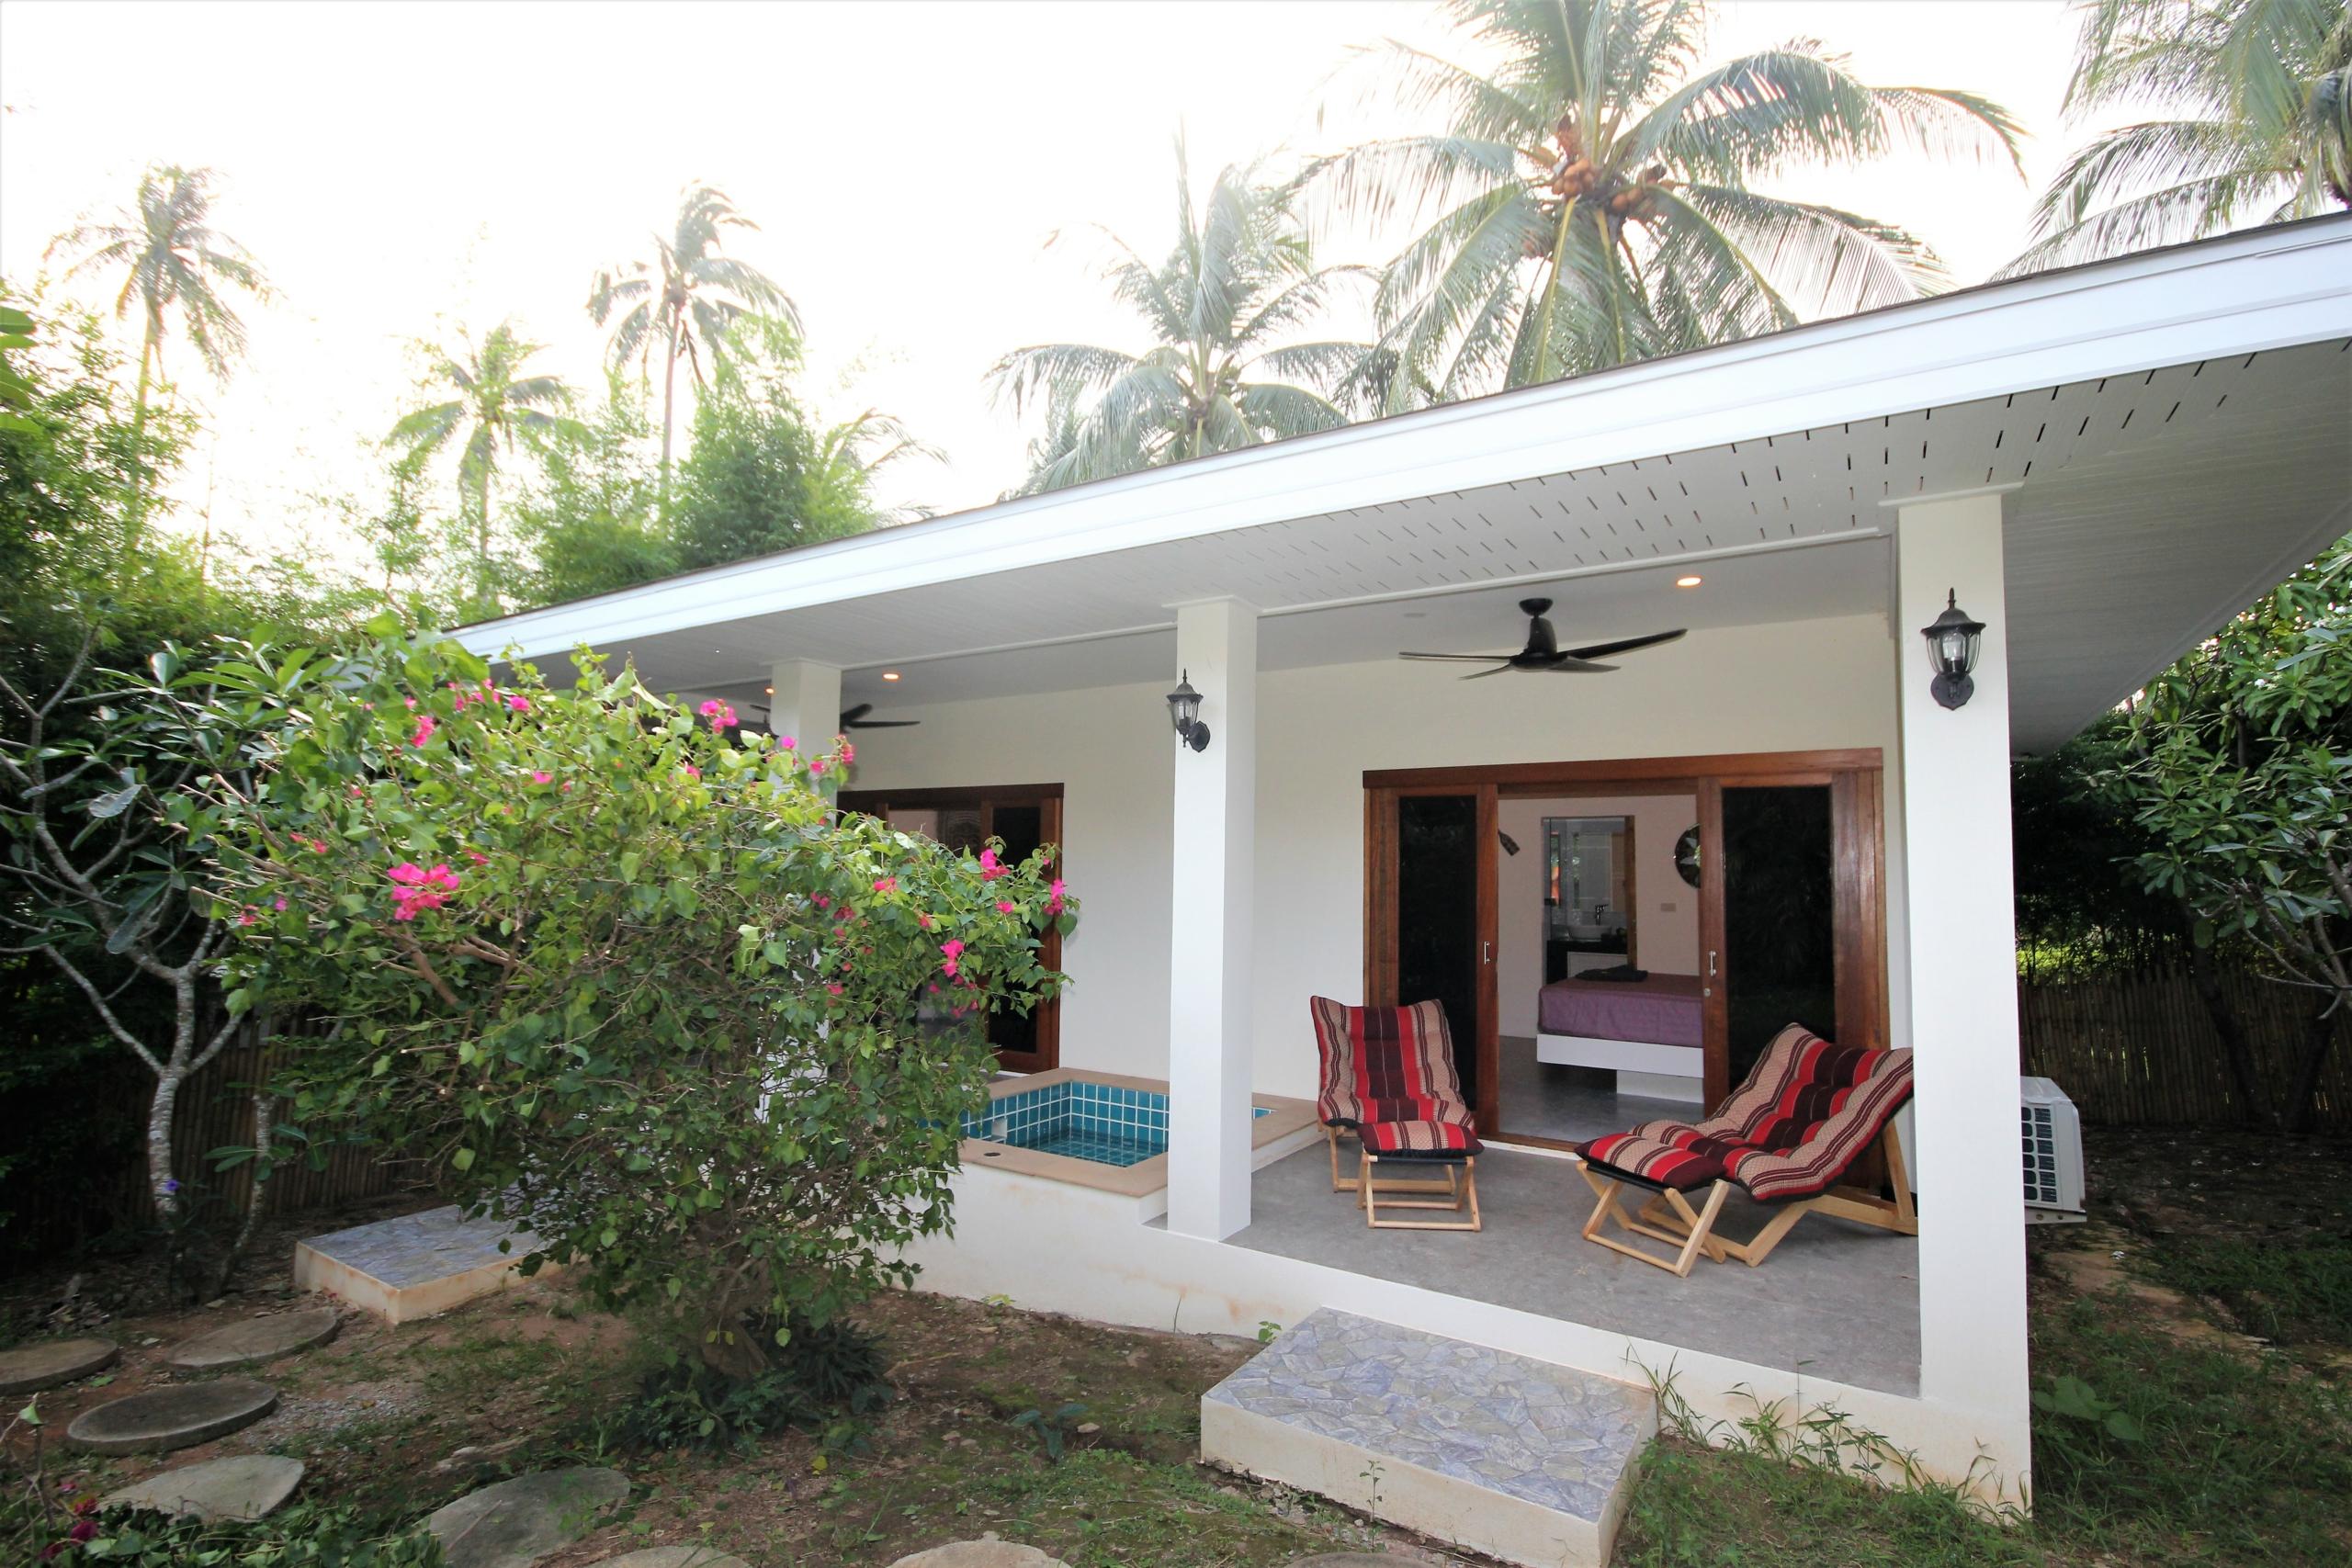 Terrace coco palm